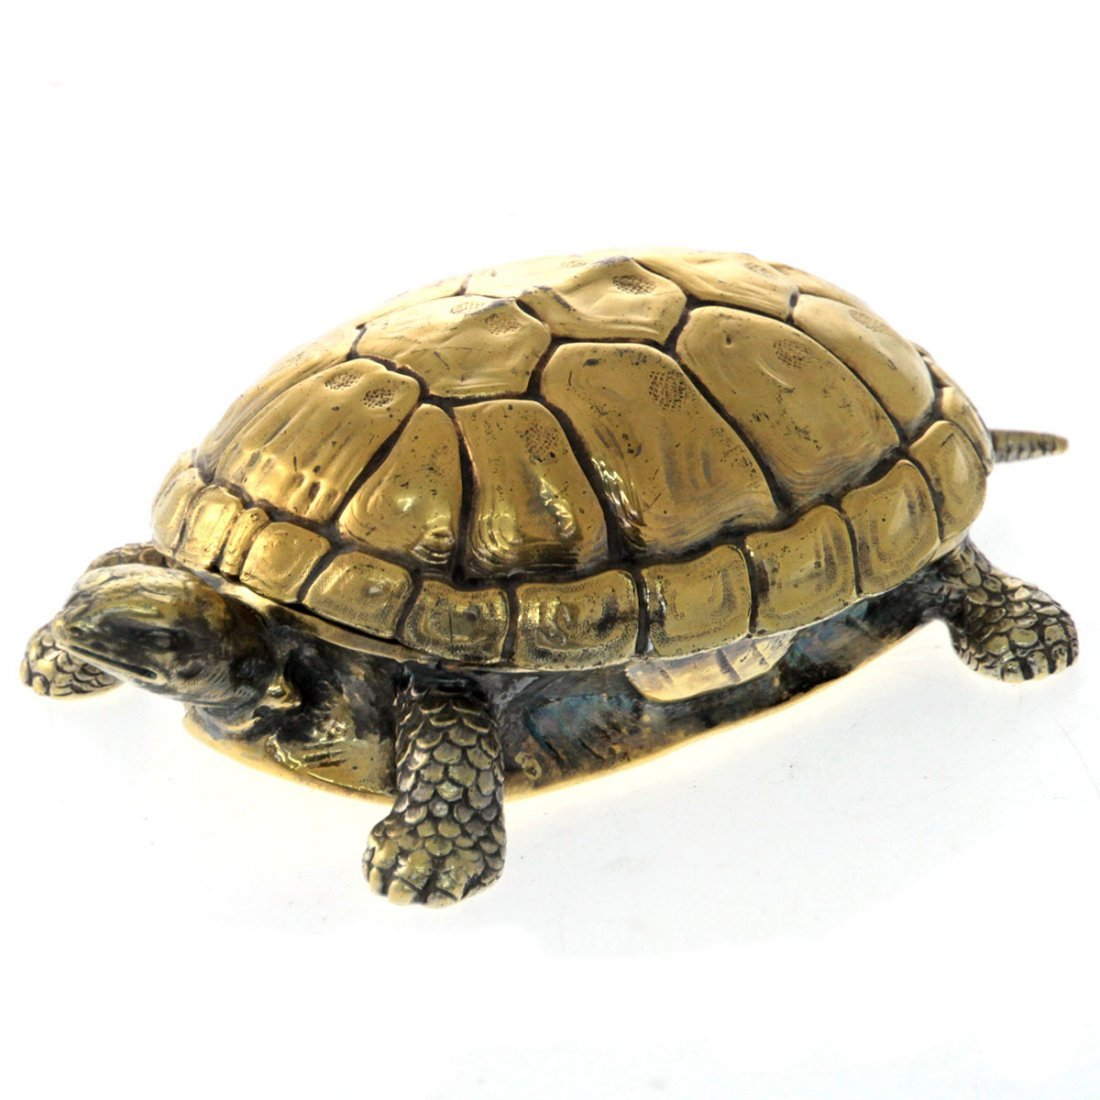 Tiffany & Co Gilt Sterling Silver Turtle Box.